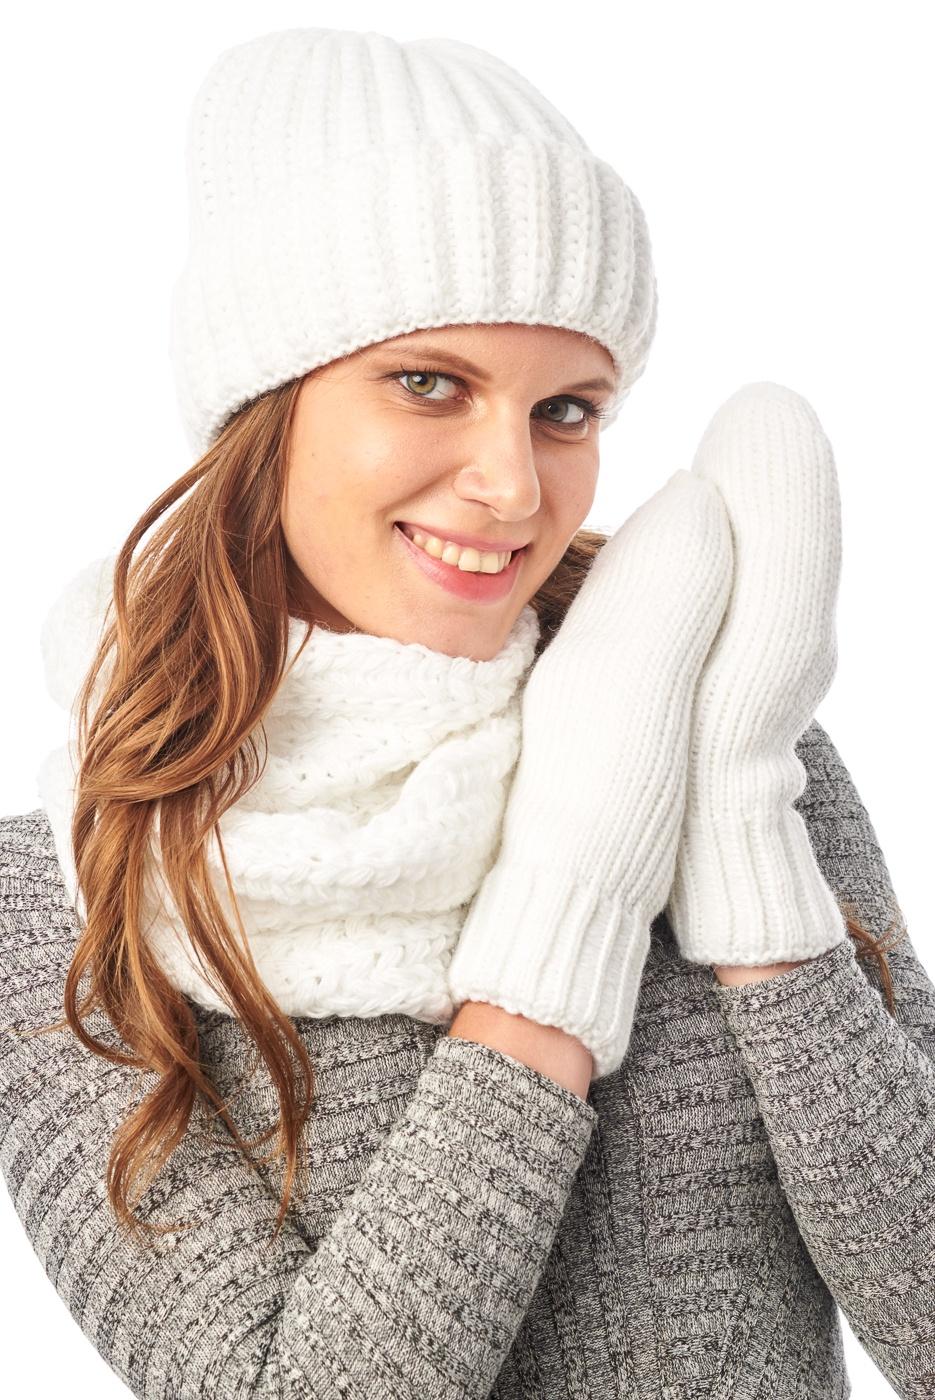 Комплект аксессуаров Nuages комплект аксессуаров детский bodo шапка снуд цвет хаки 13 10u размер 52 54